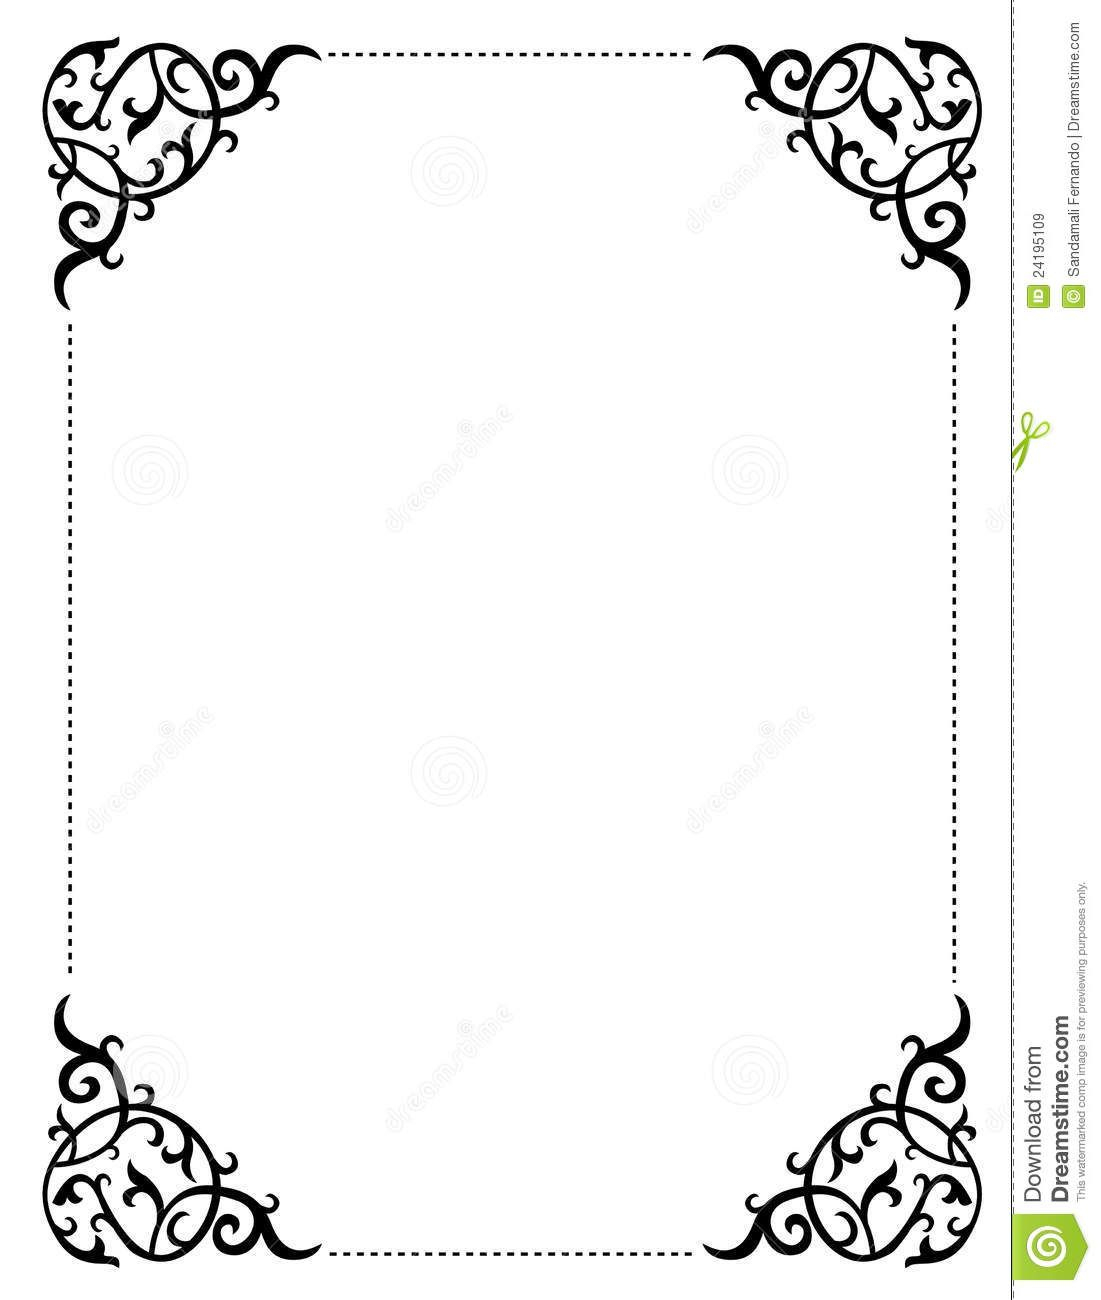 Free Printable Wedding Clip Art Borders And Backgrounds Invitation - Free Printable Wedding Clipart Borders